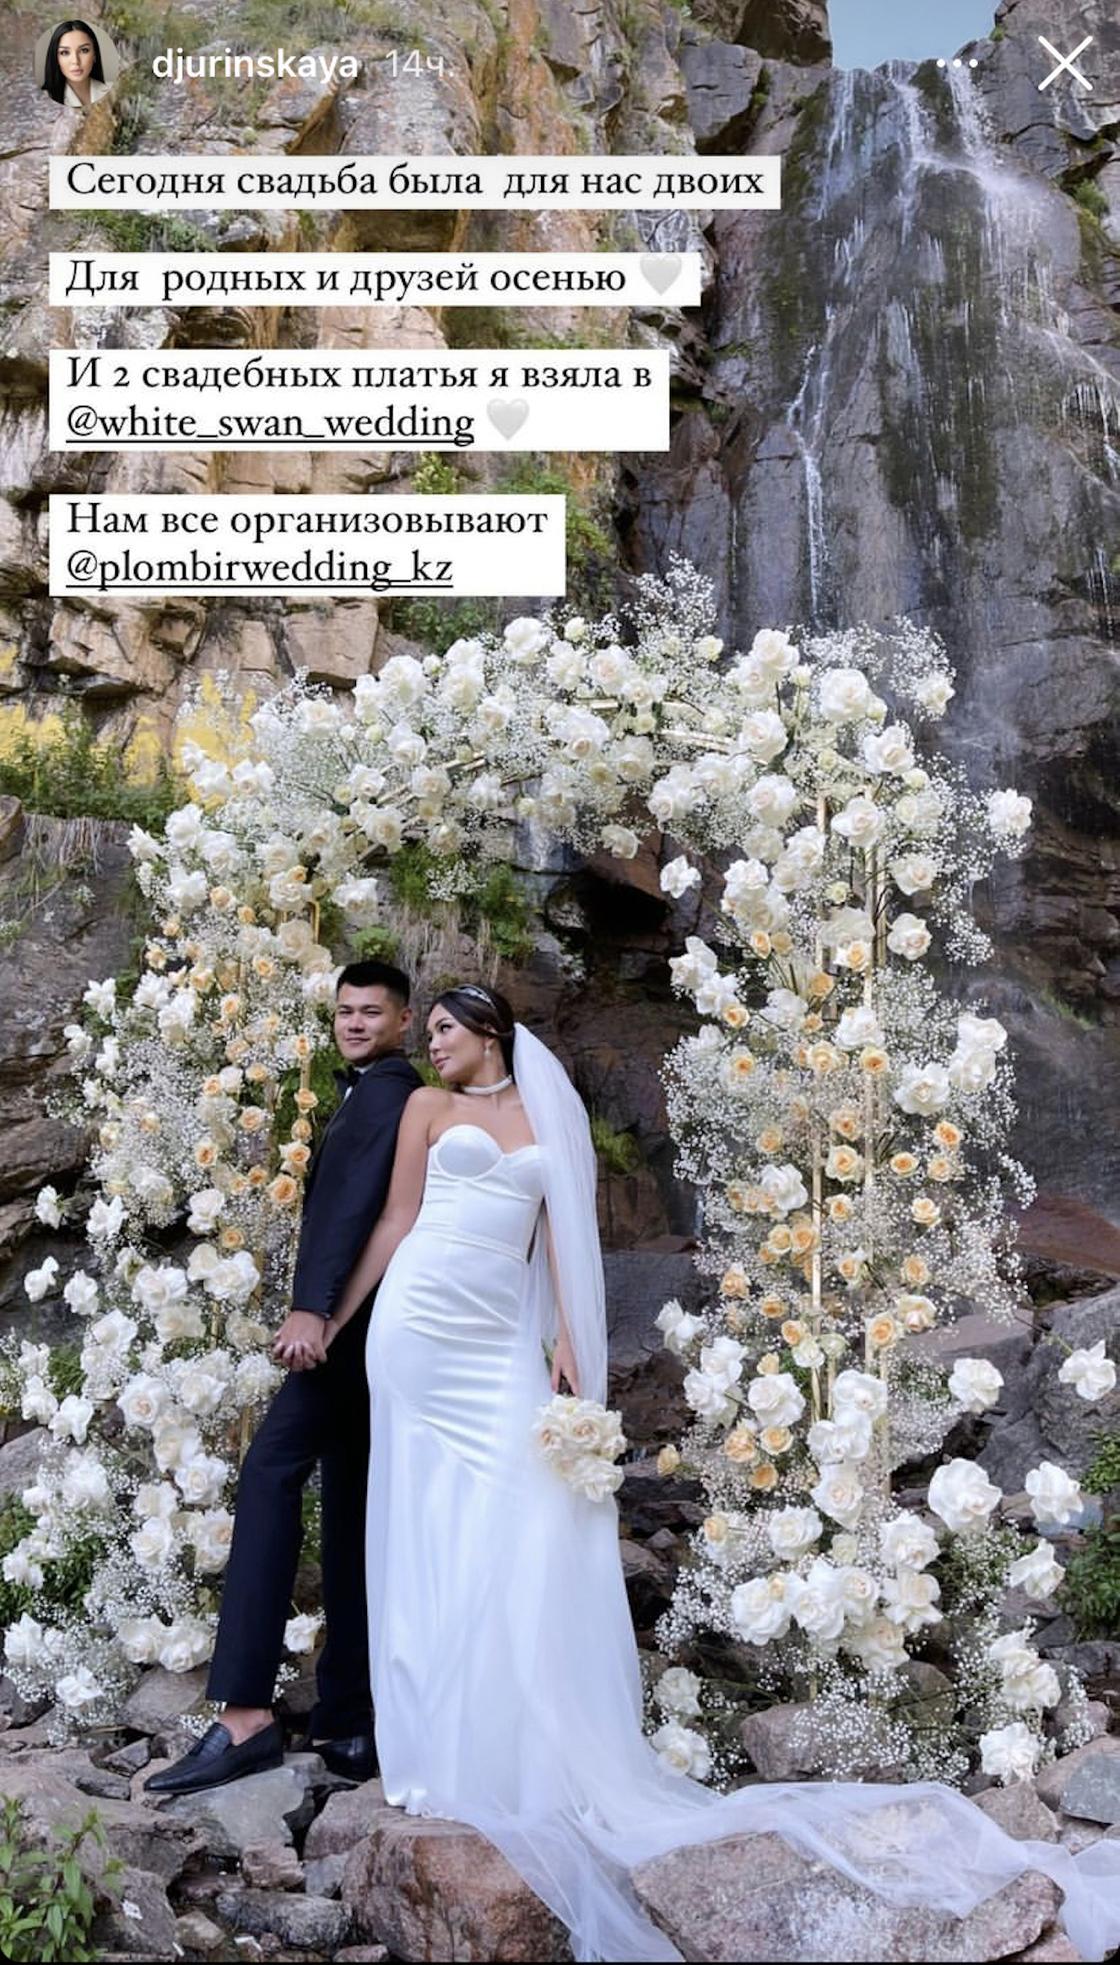 Жания Джуринская и Данияр Хизметов